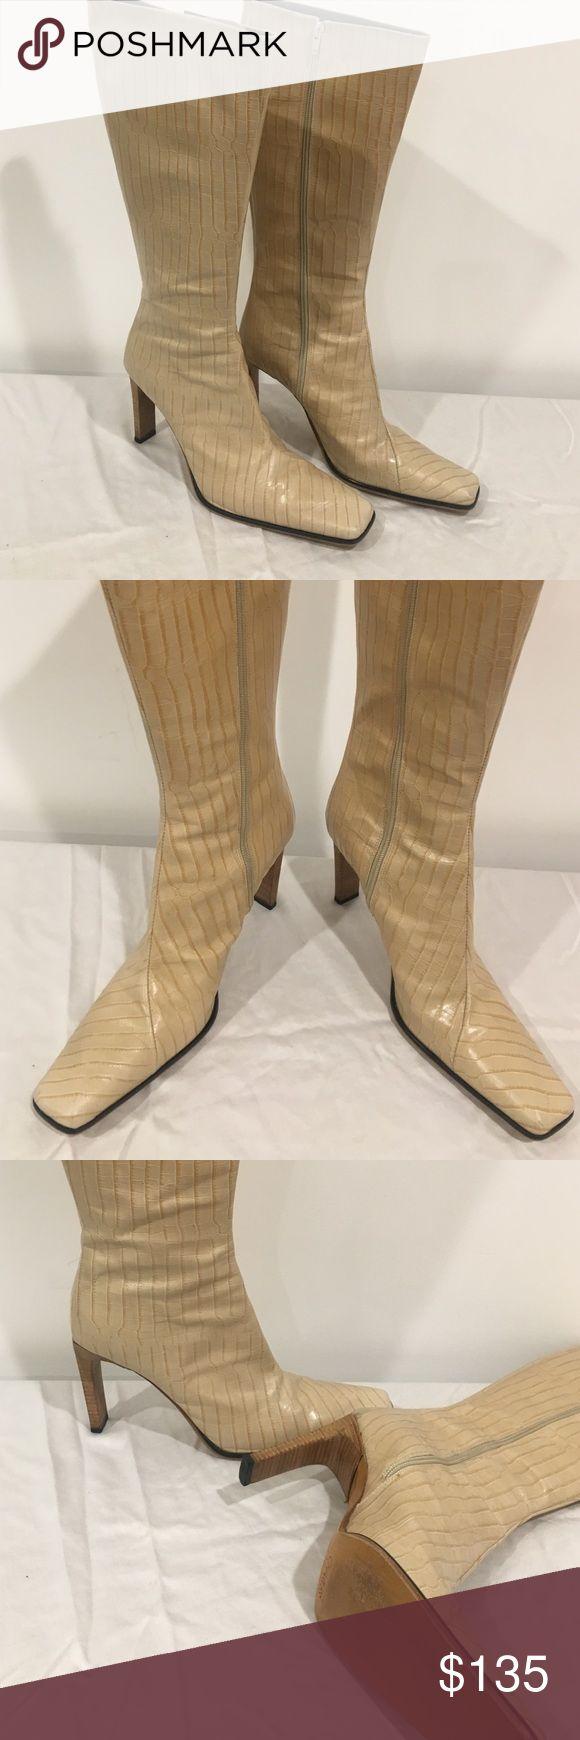 Charles David Croco Beige Boots Charles David Croco Beige Boots - Gently used - in box Charles David Shoes Heeled Boots